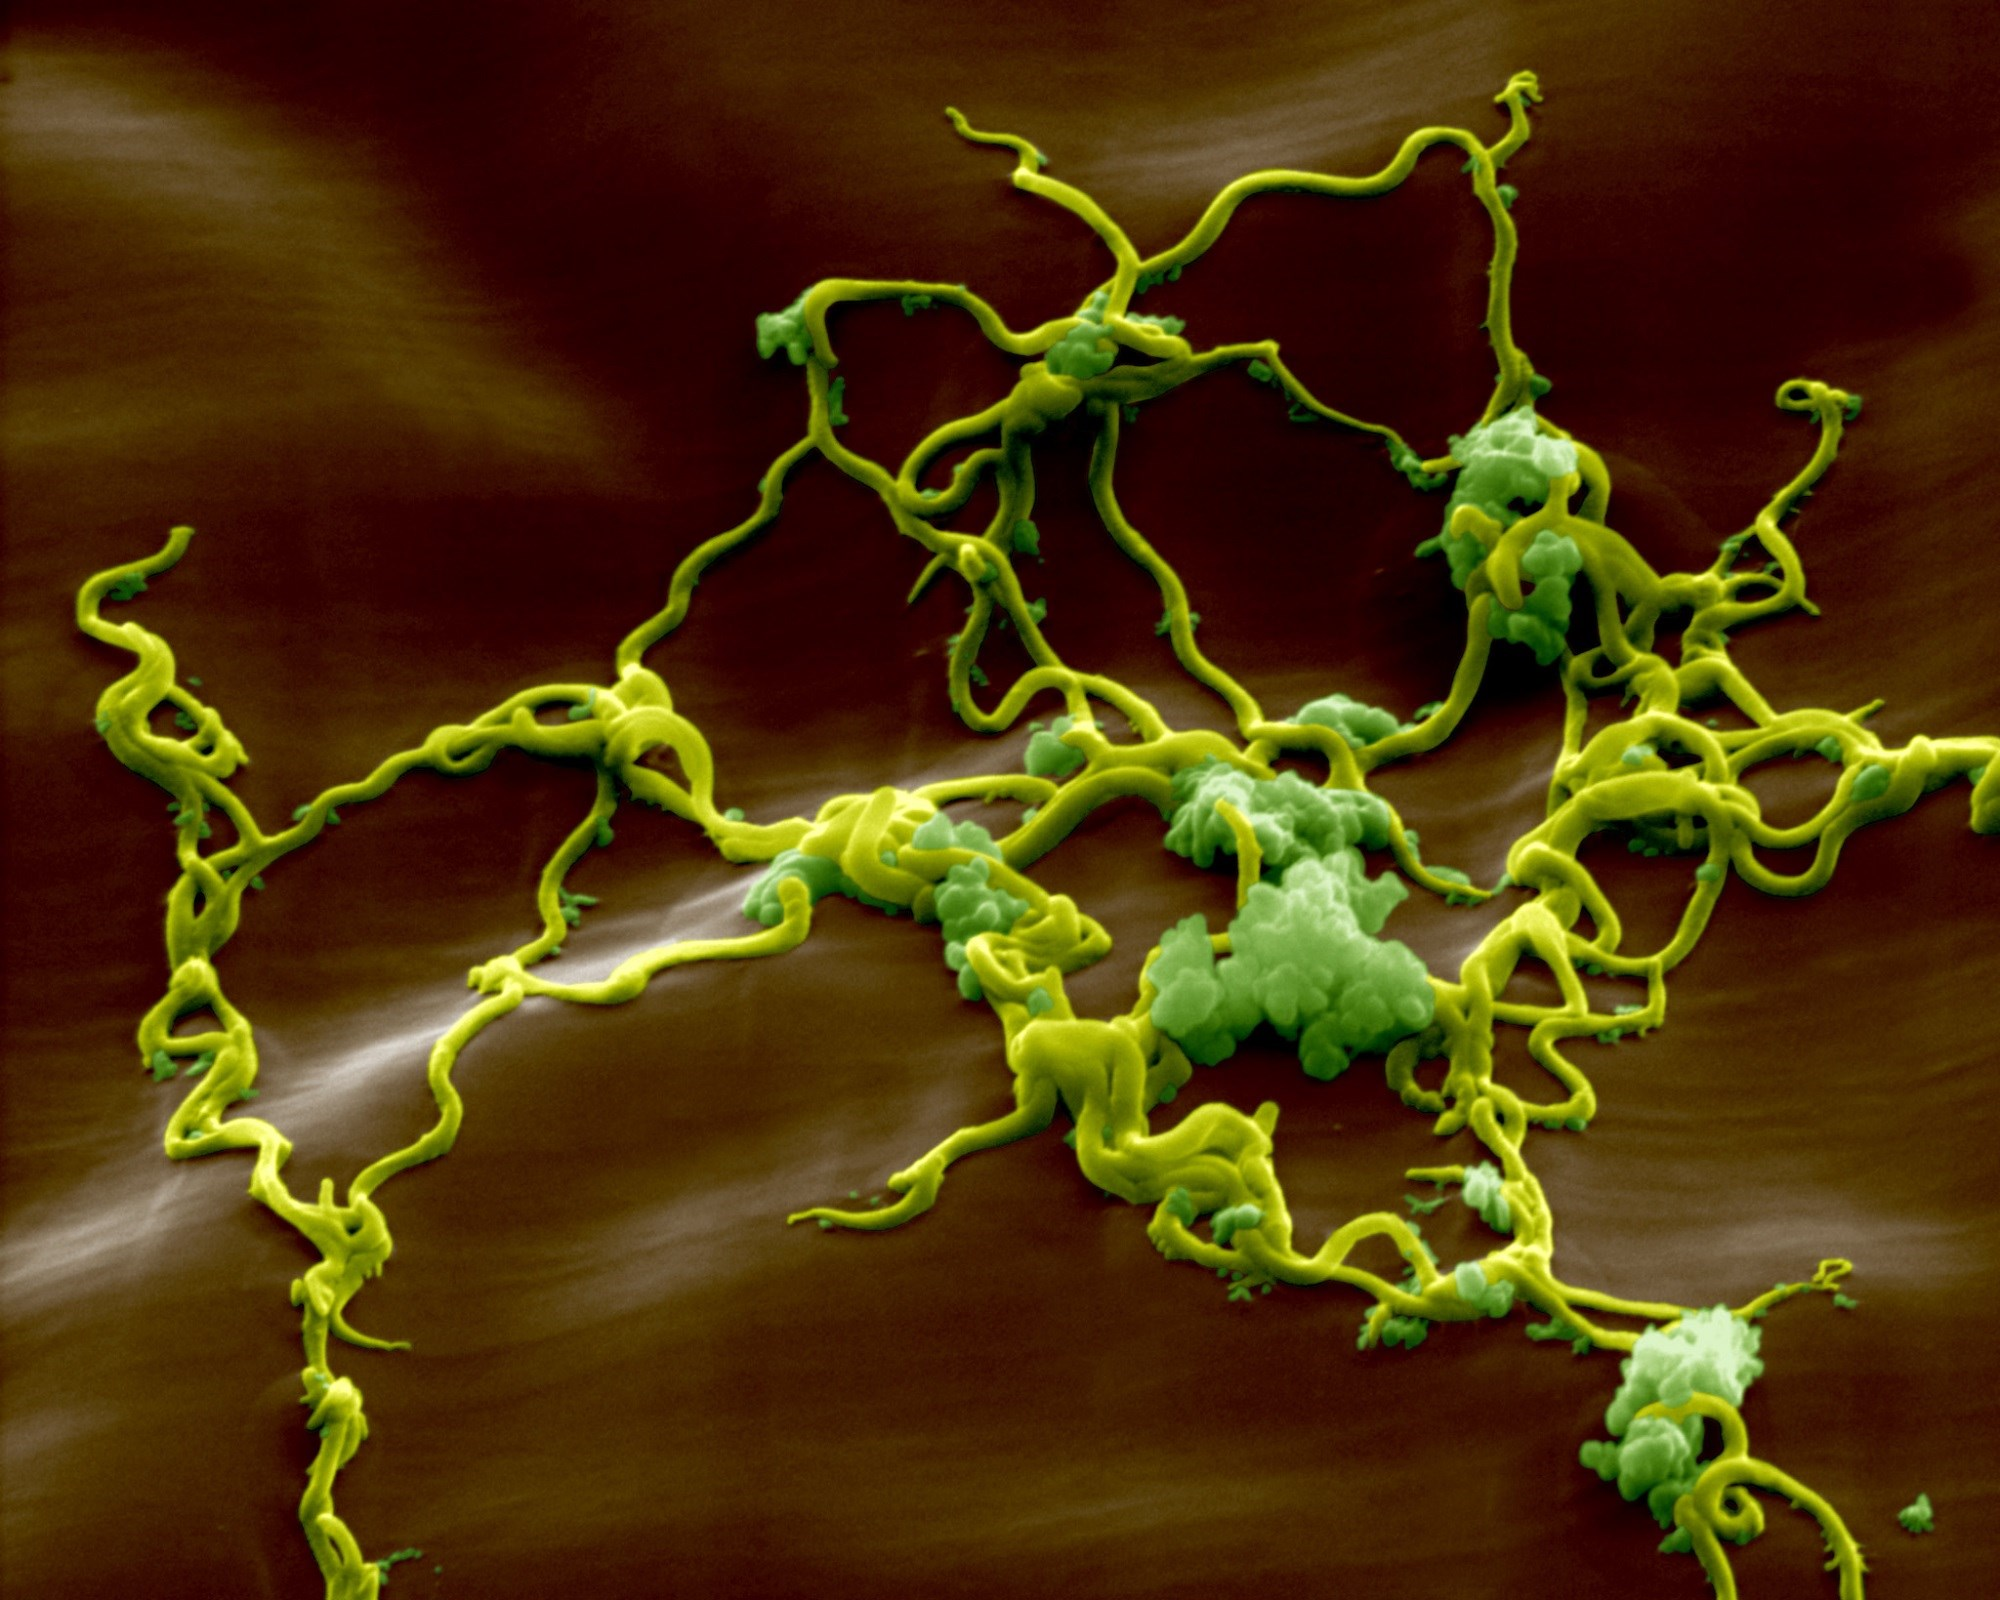 Diagnosing Lyme Disease in Children With Neuropsychiatric Illness